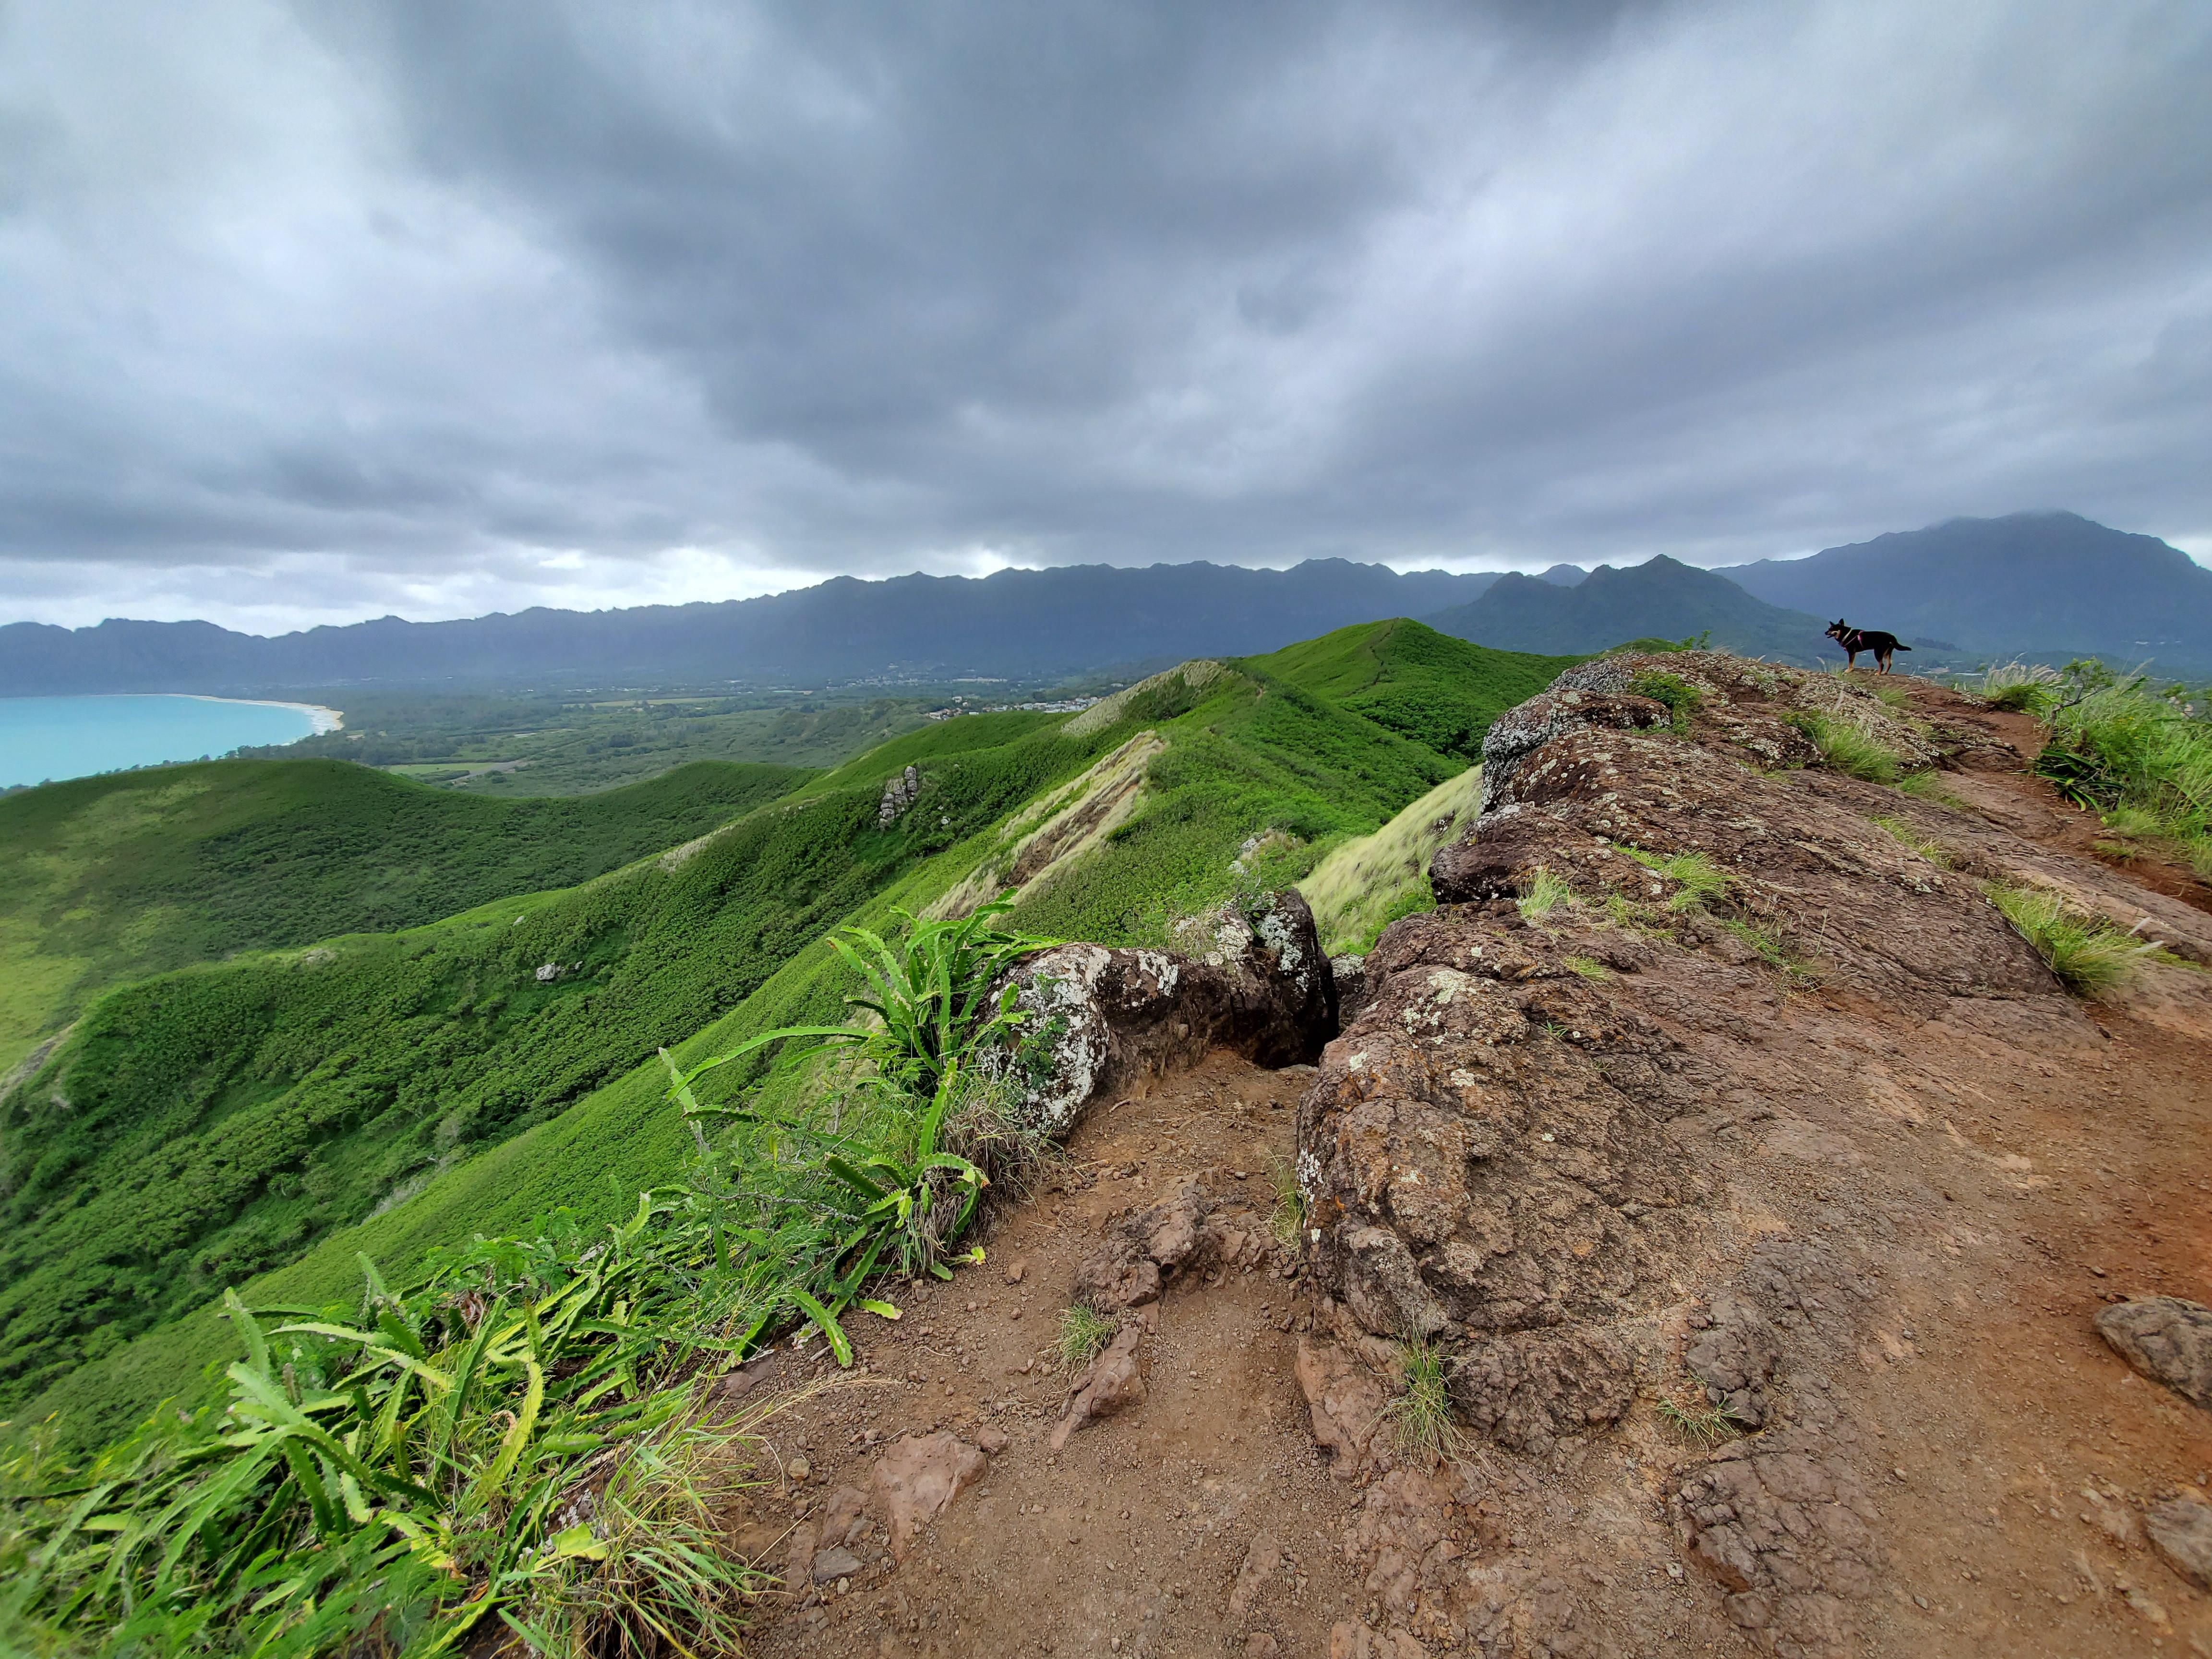 A cloudy day for hiking Lanikai pillbox trail Oahu Hawaii ...